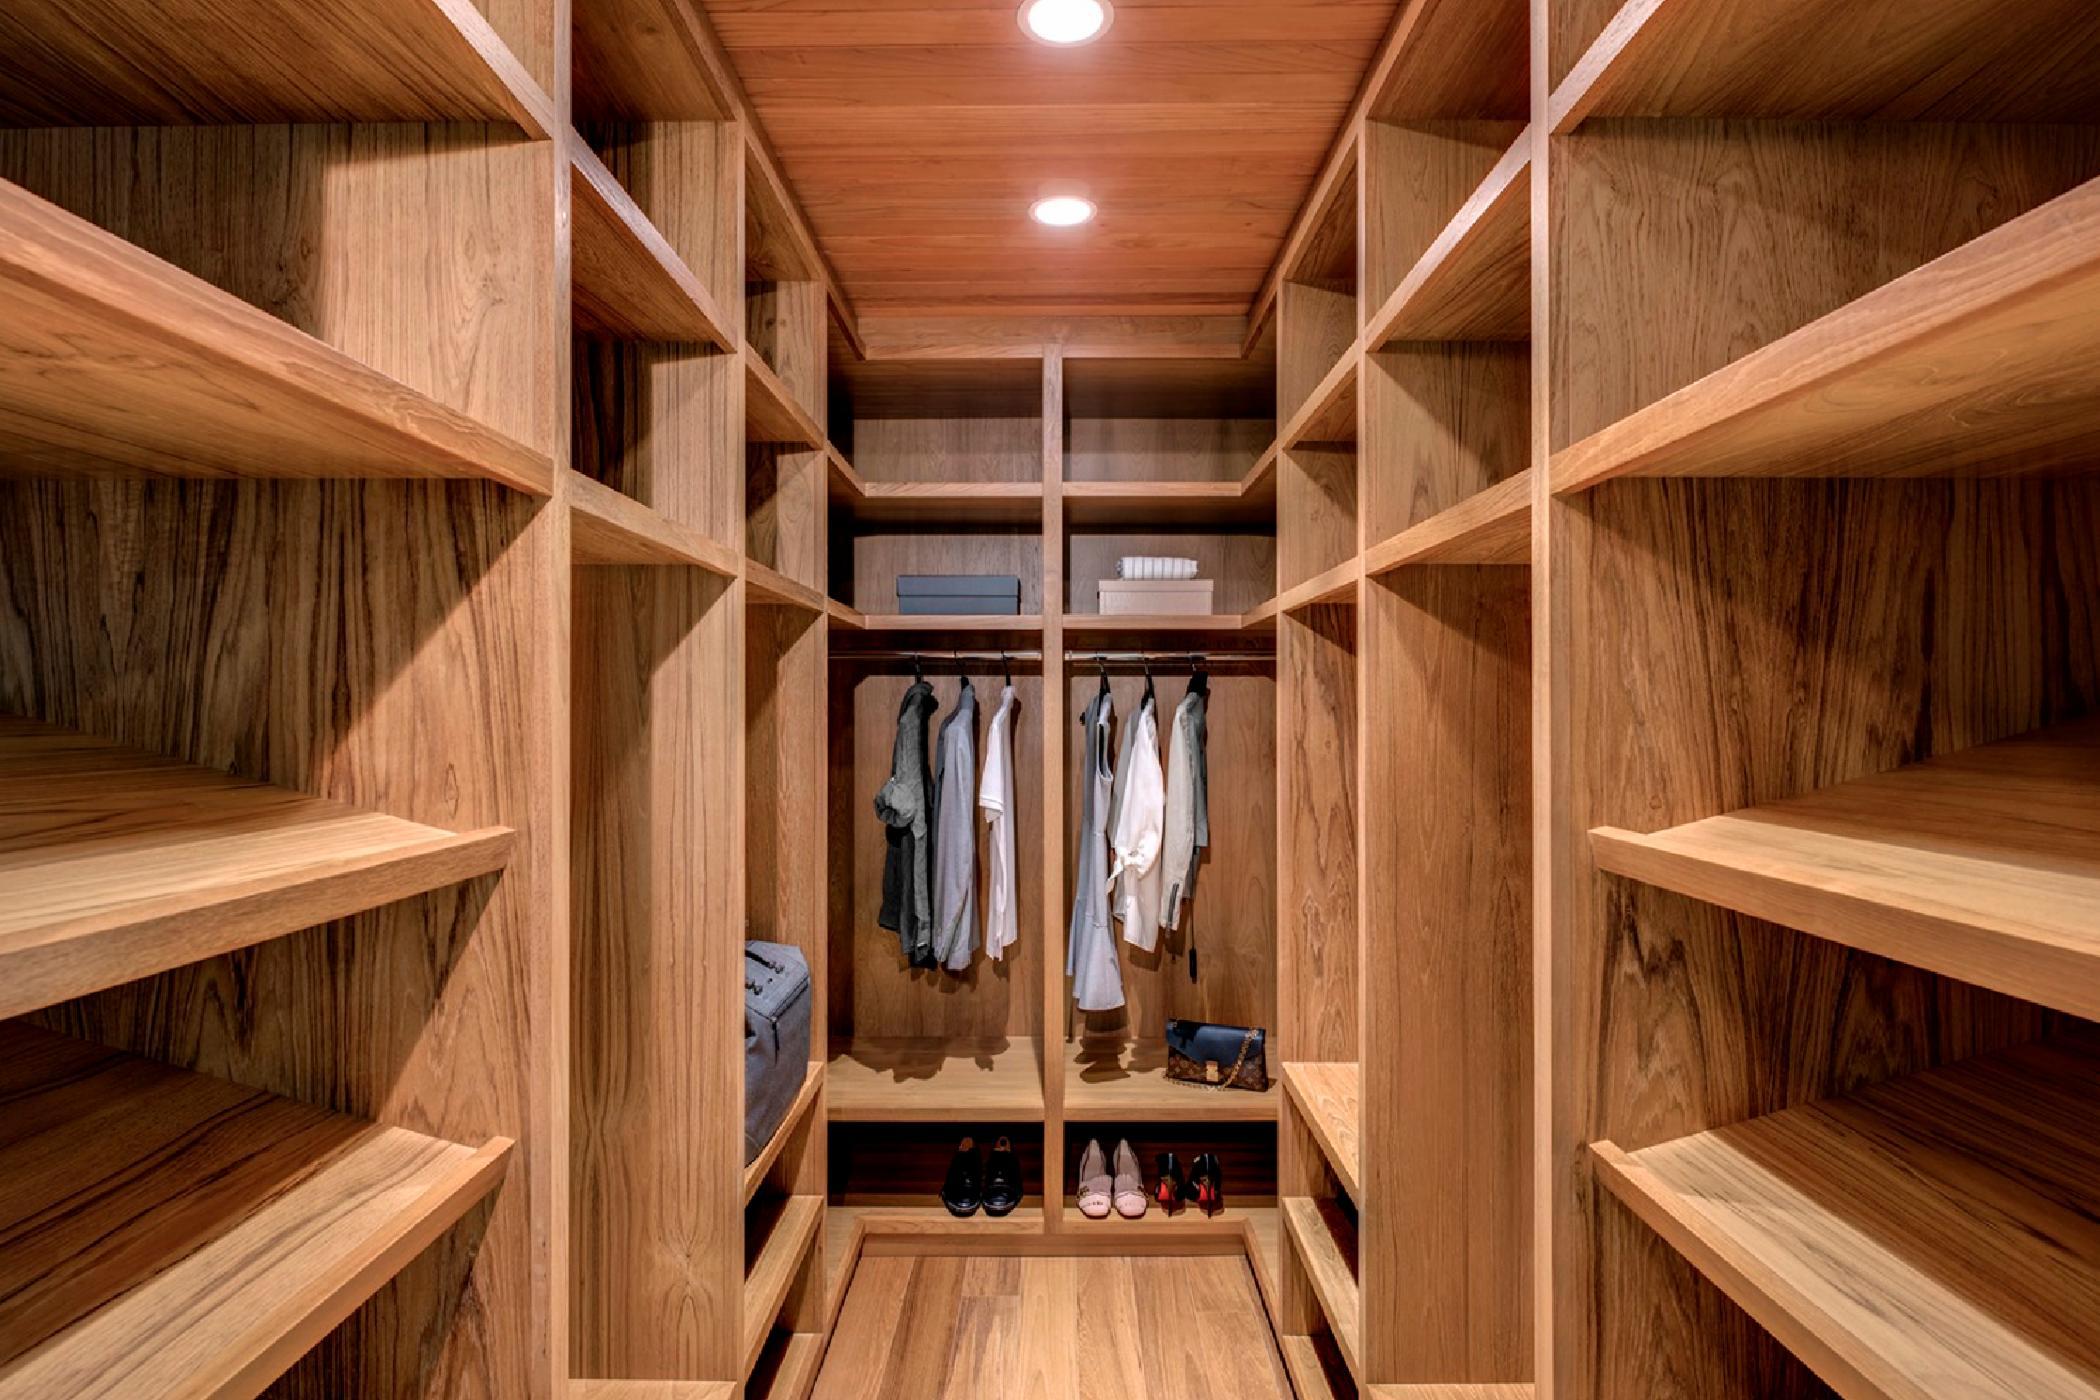 1253_Unit4_2ndFloor_Closet16266 Panorama.jpg